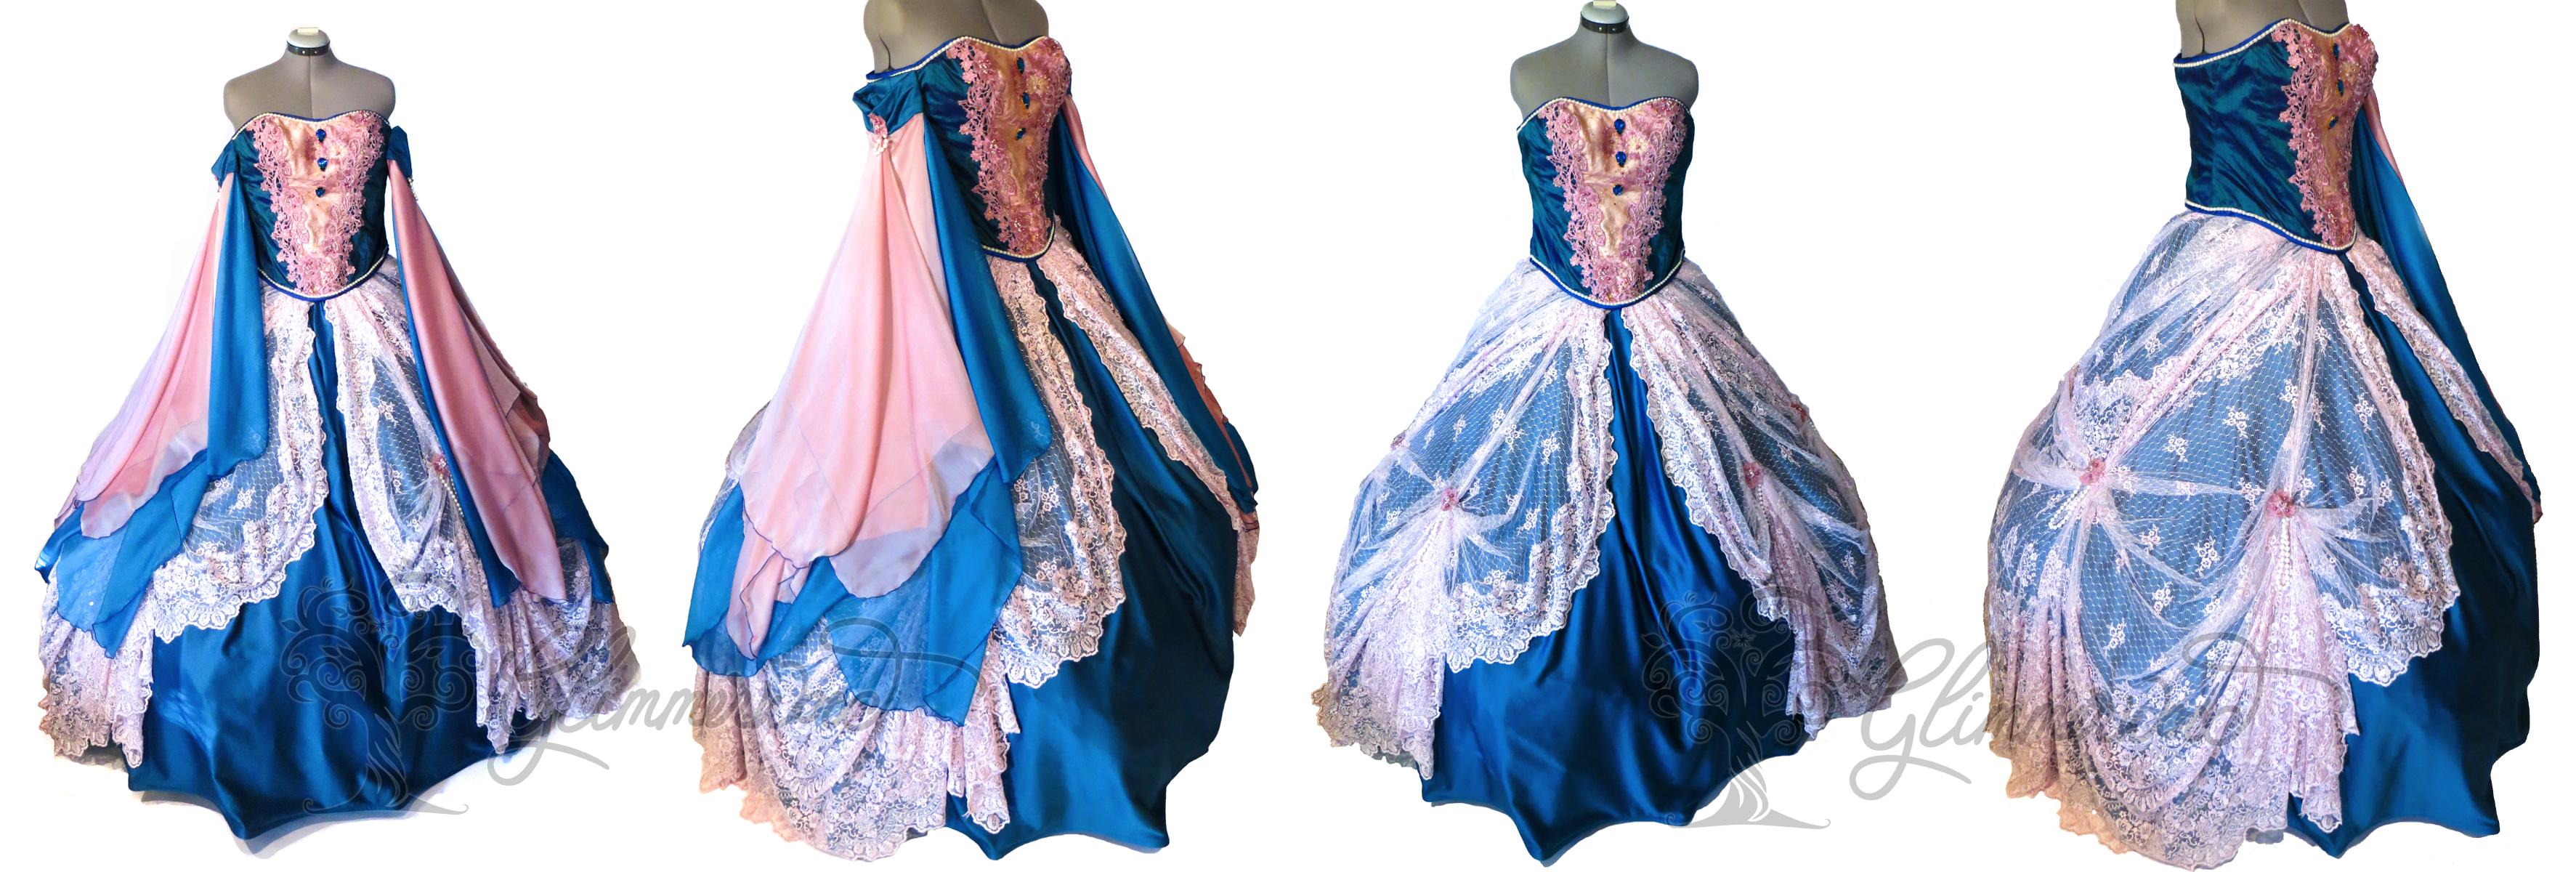 Original Ballgown